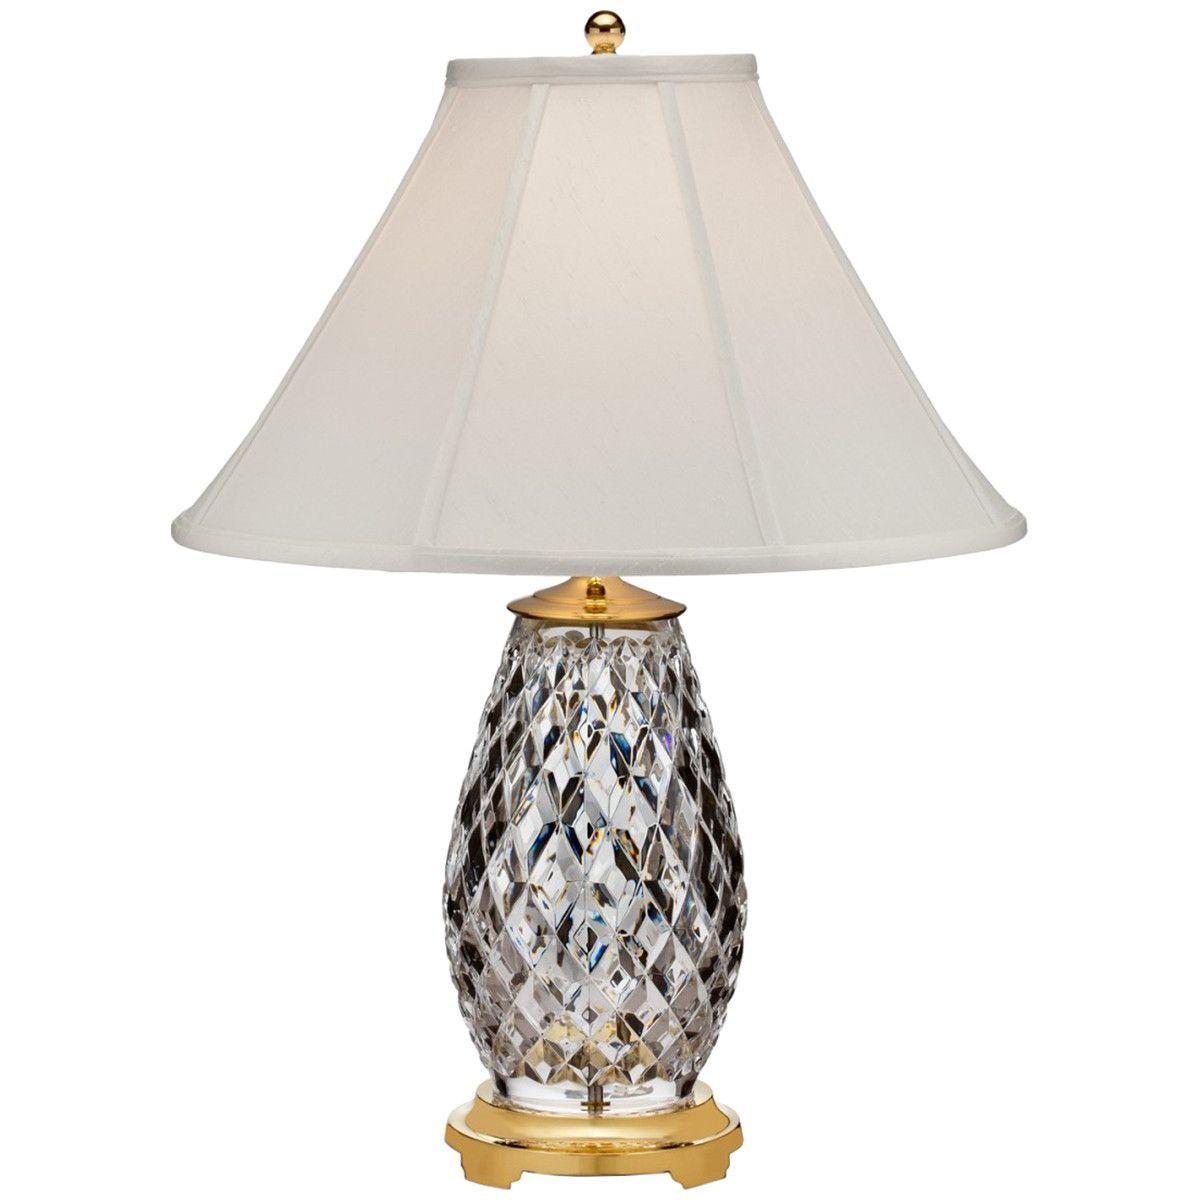 Waterford lighting diama table lamp 28 polished brass polished waterford lighting diama table lamp 28 polished brass arubaitofo Gallery